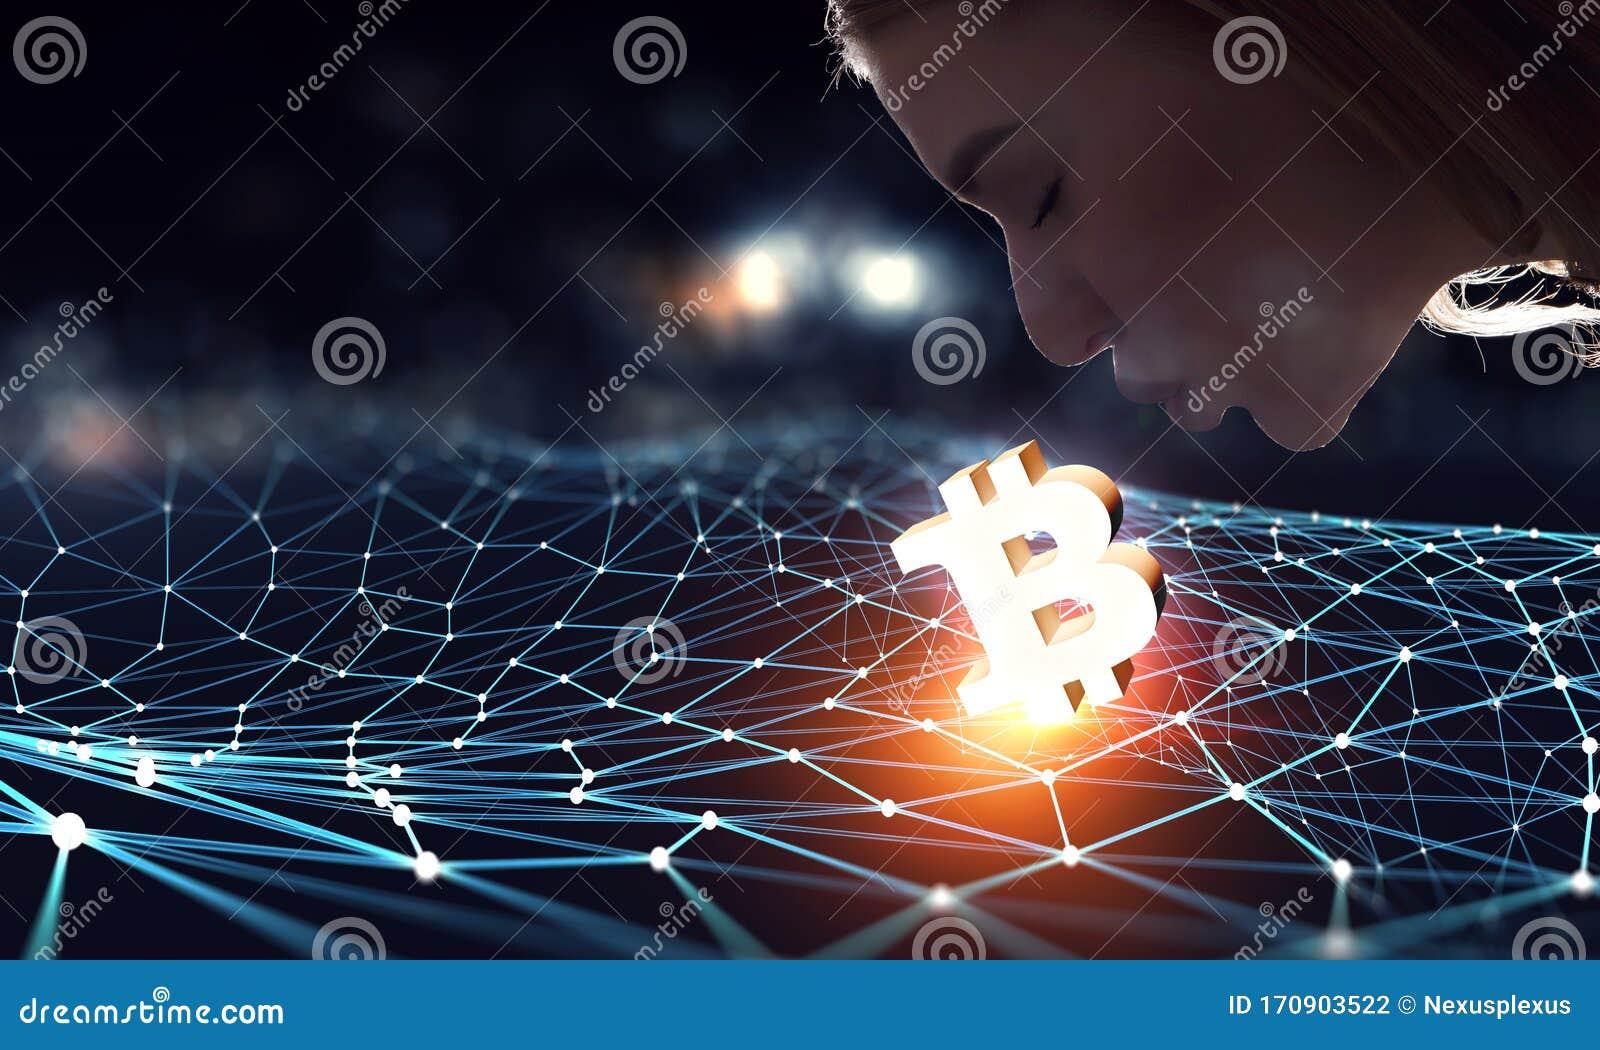 earn using bitcoin